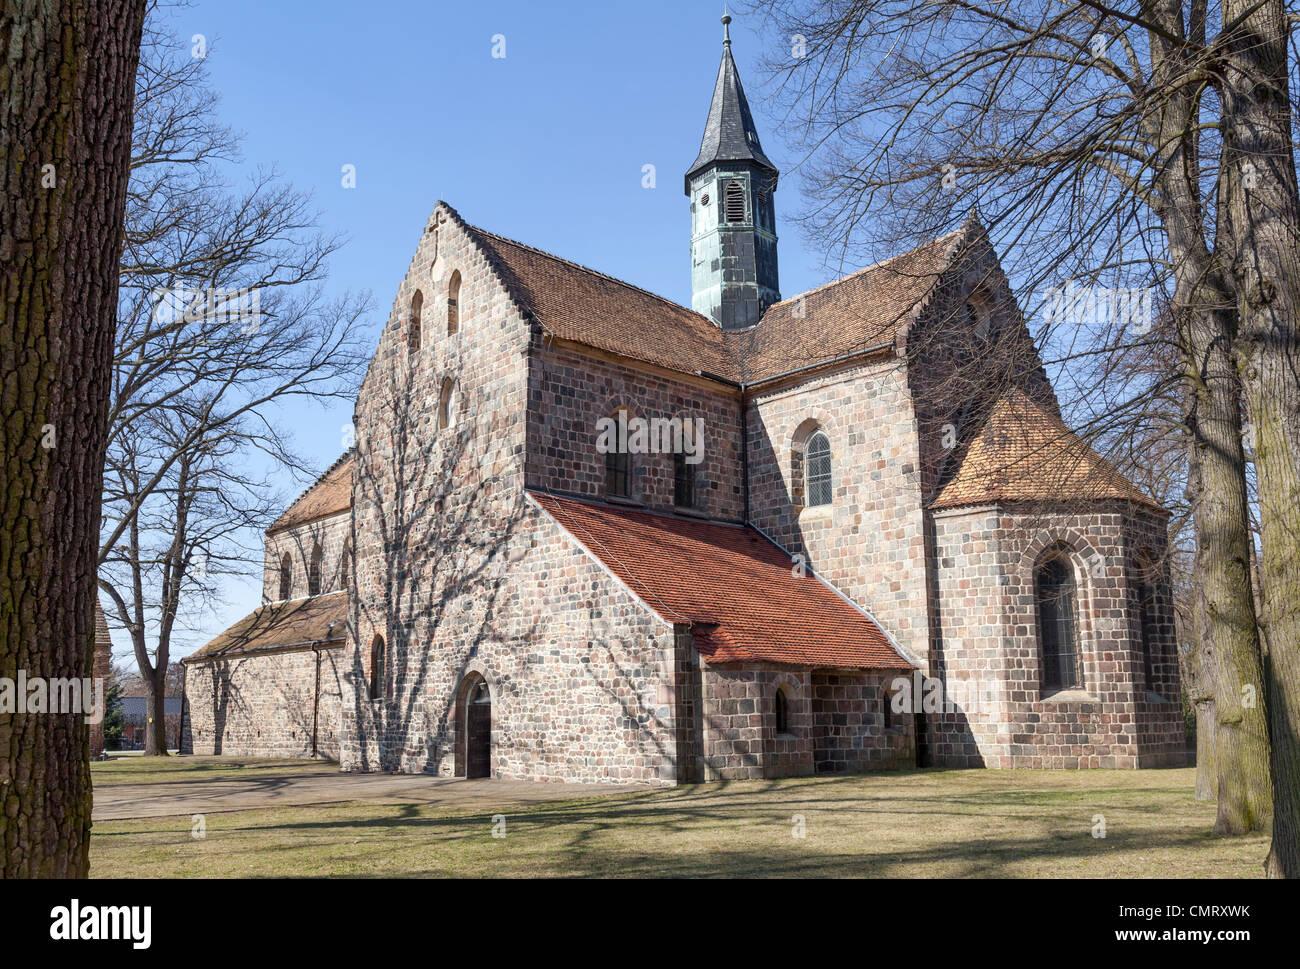 Klosterkirche, Kloster Zinna, Jüterbog, Brandenburg, Germany - Stock Image